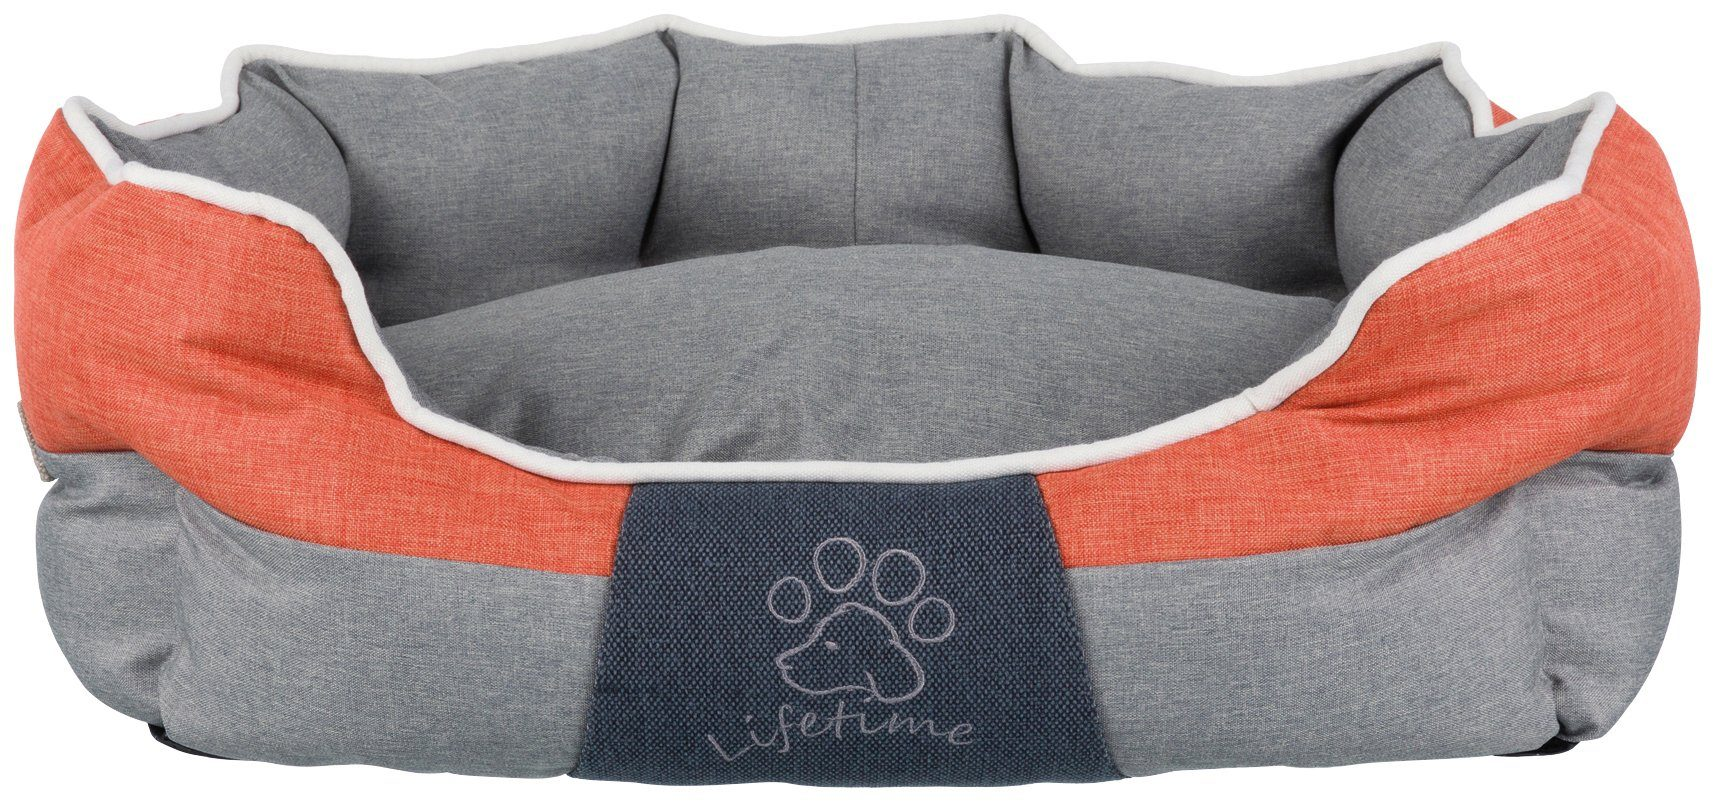 TRIXIE Hundebett und Katzenbett »Joris«, BxT: 60x50 cm, grau/orange